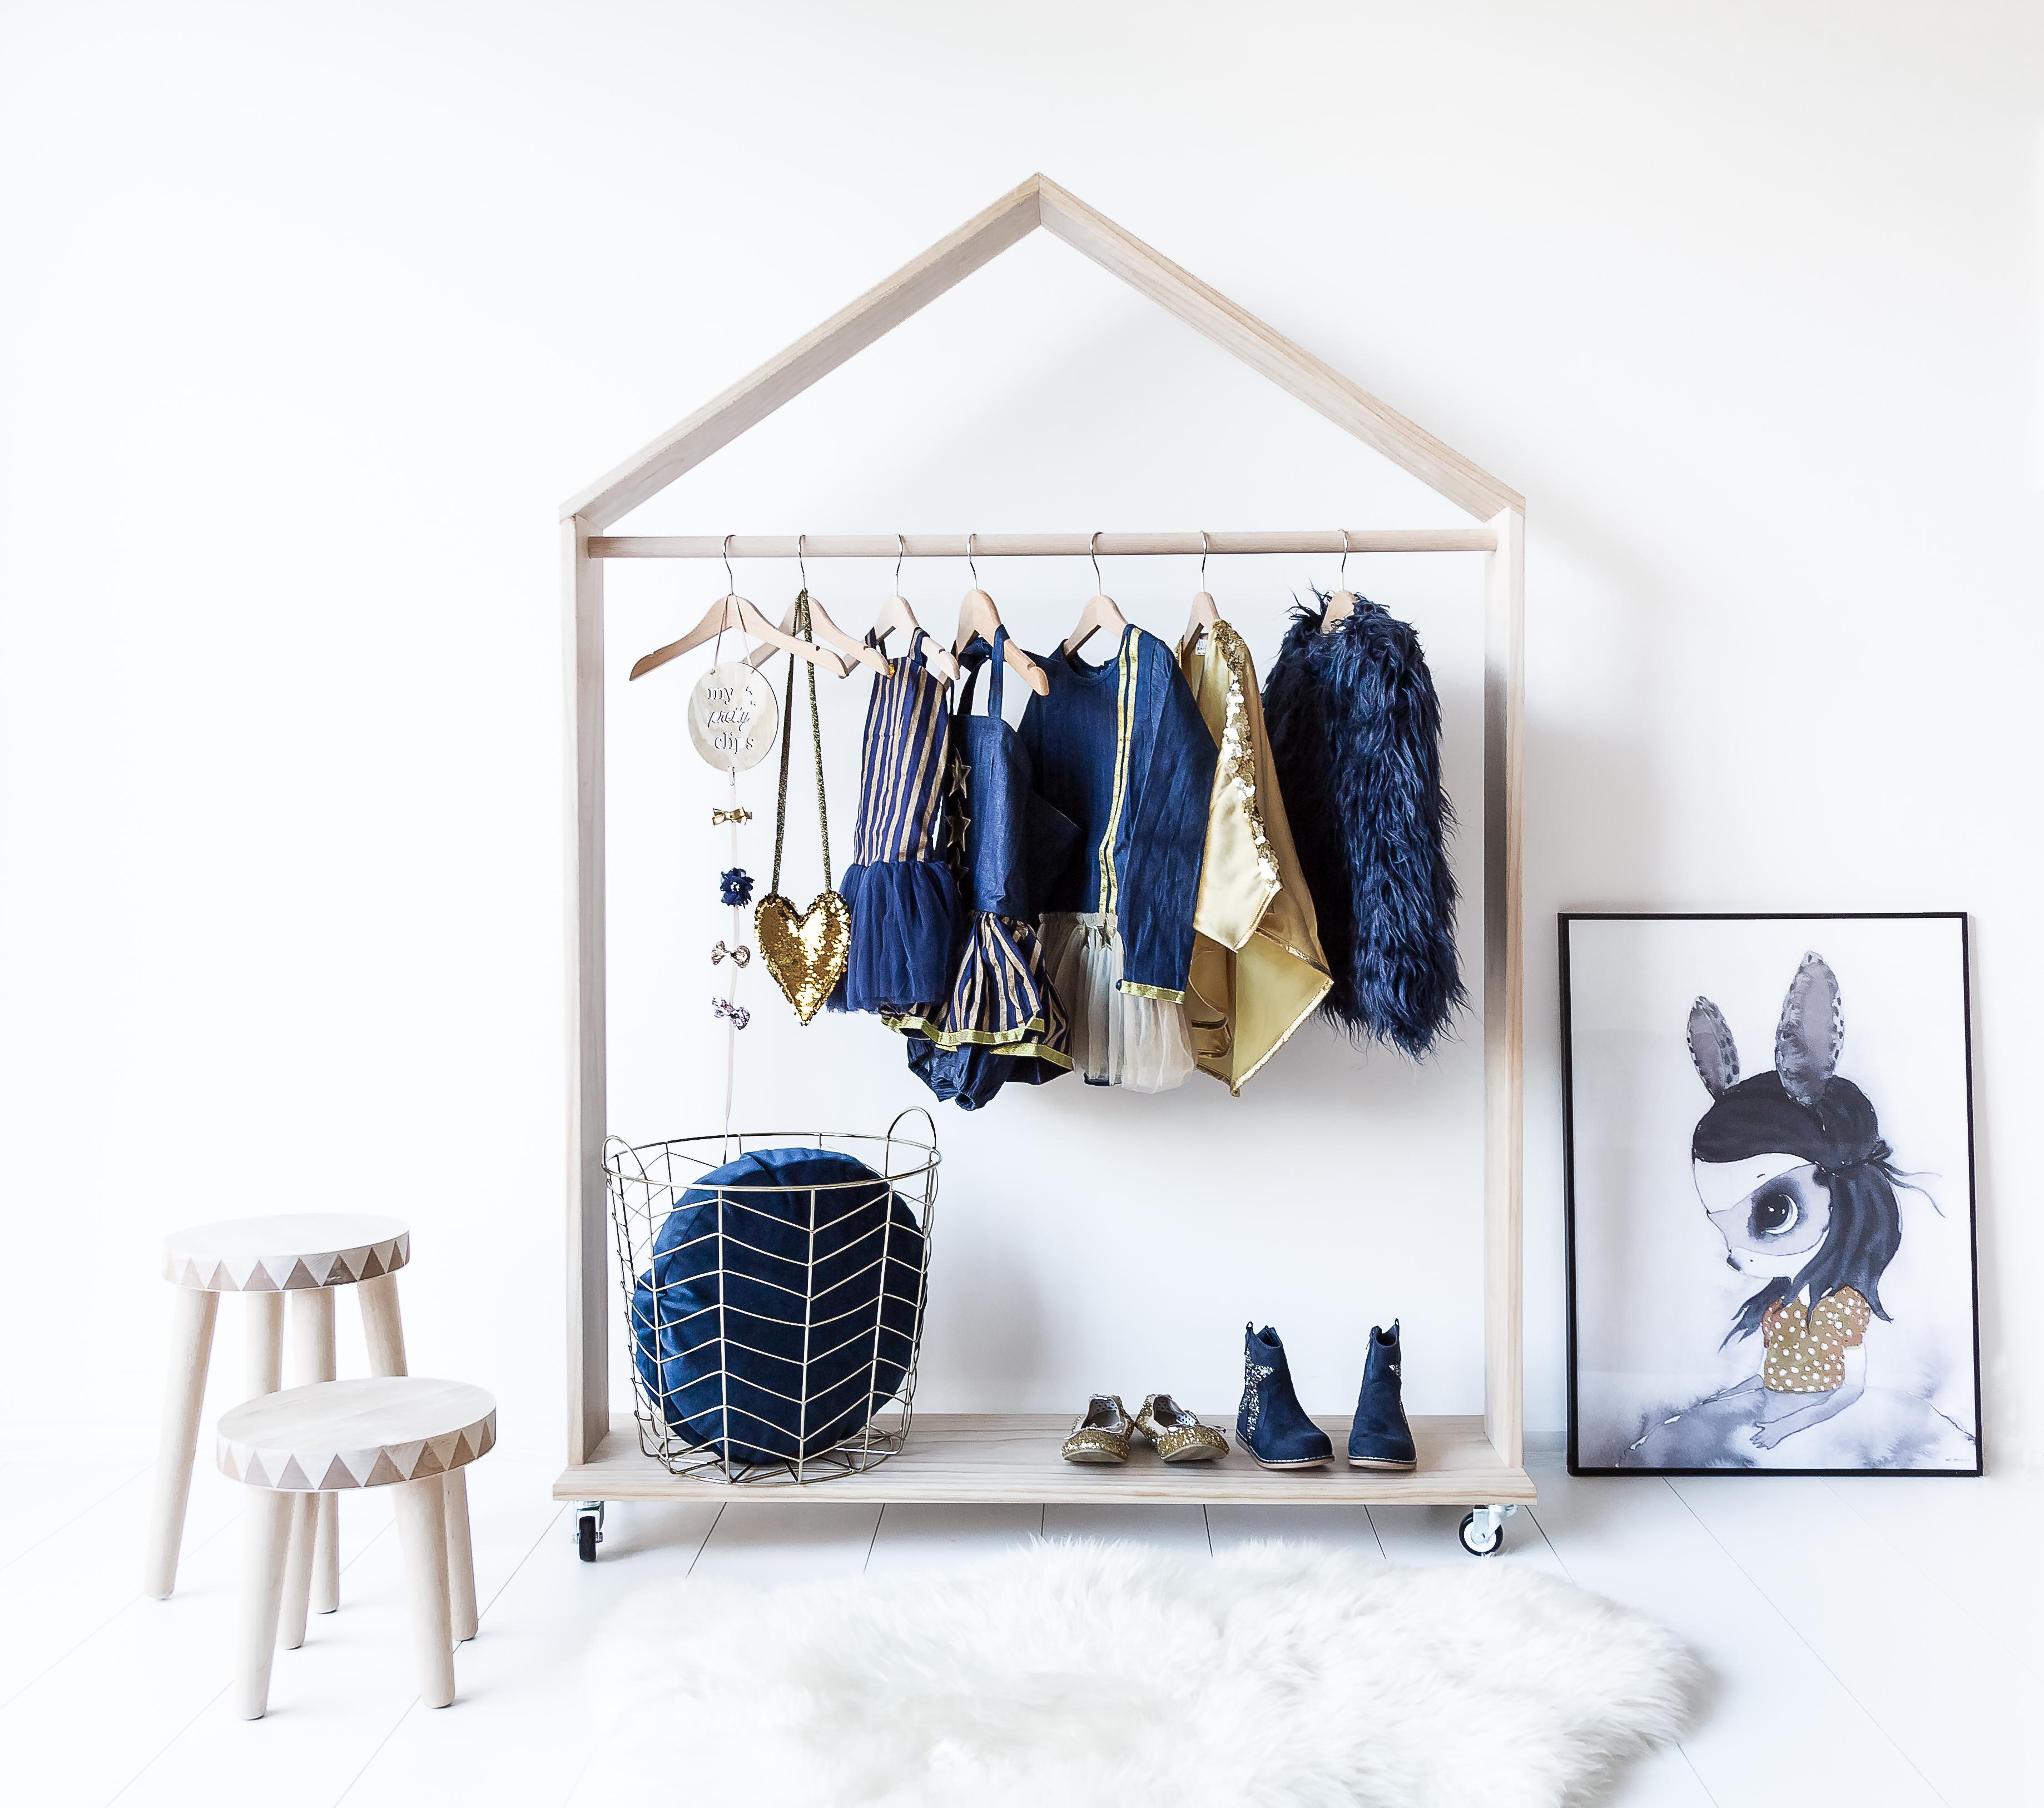 Leuke houten kledingrek voor de kinderkamer